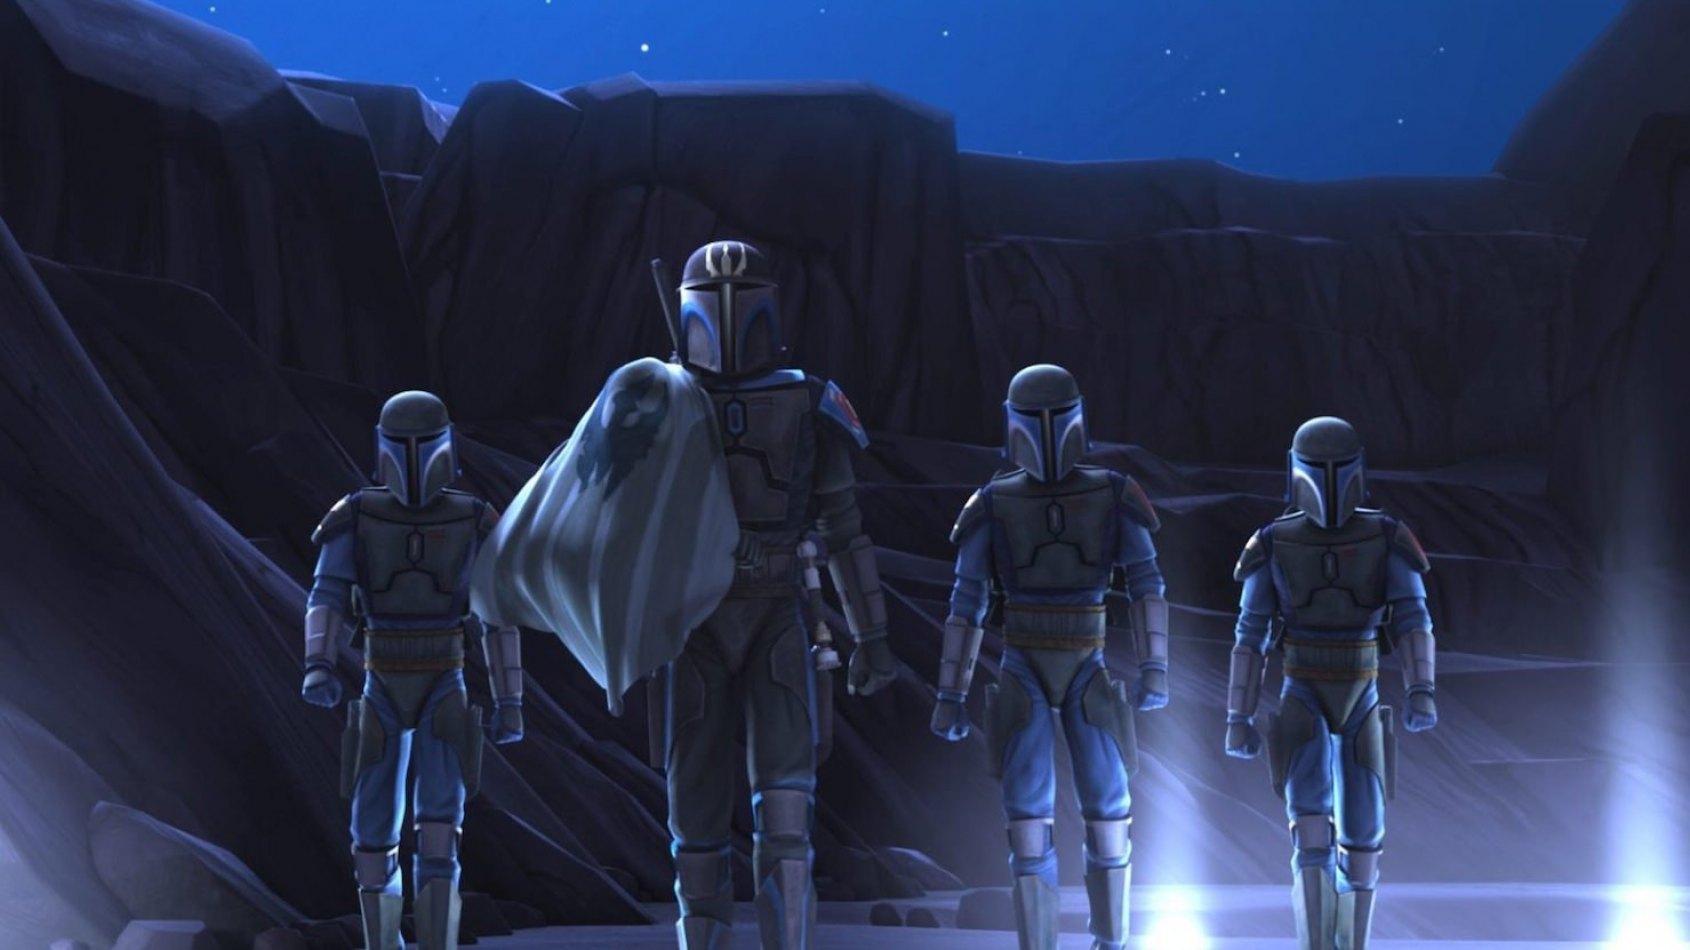 Les guerriers dans la saga Star Wars